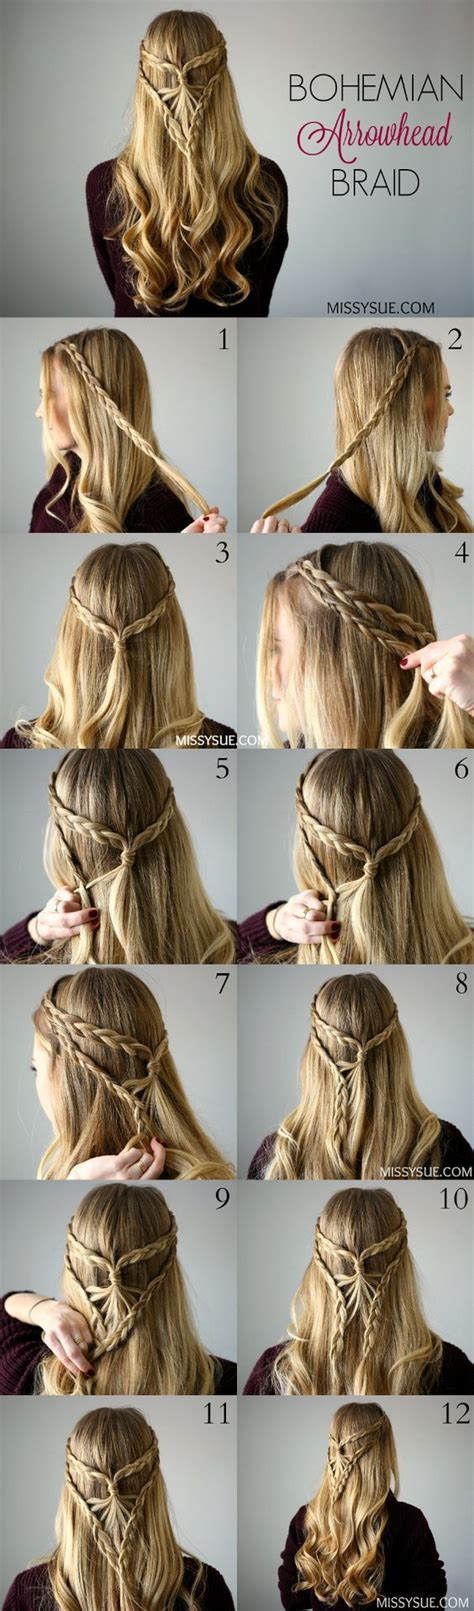 Easy Braided Hairstyles Tutorials by Best 20 Braided Hairstyles Tutorials Ideas On